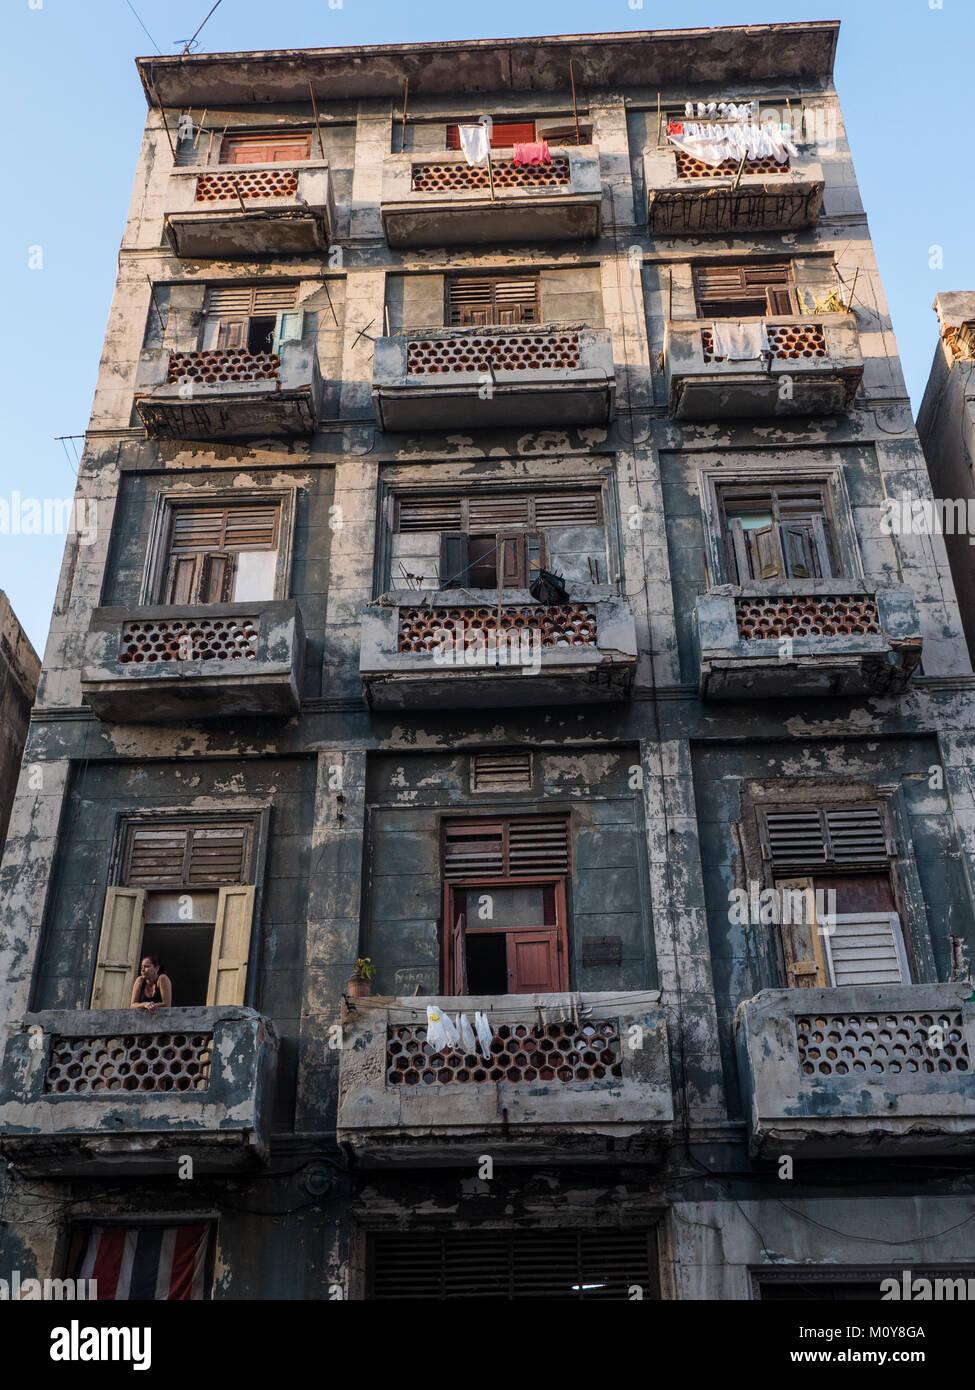 Decrepit soviet style building in Havana, Cuba - Stock Image